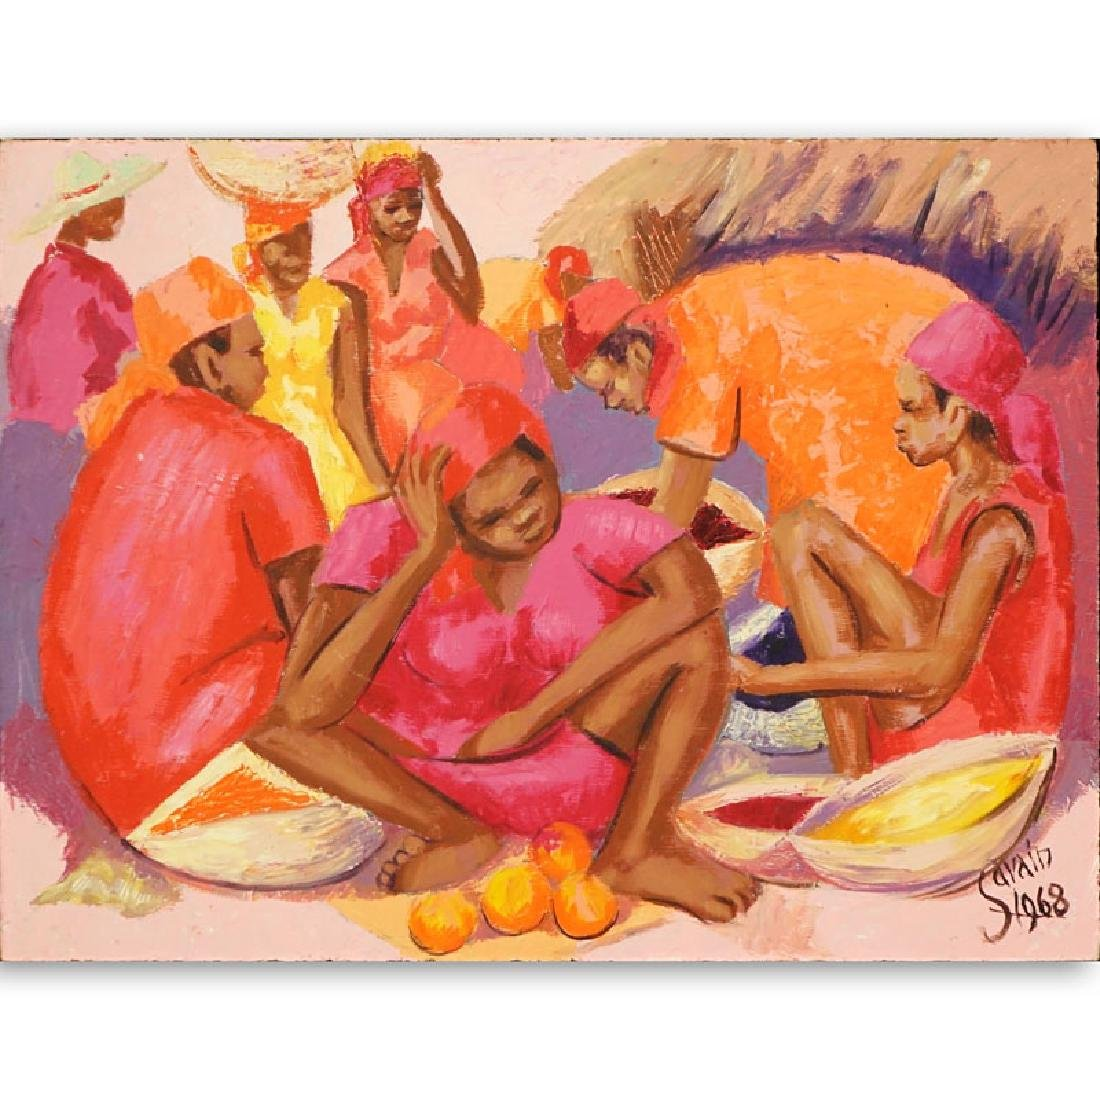 Petion Savin, Haitian (born 1927) Acrylic on board